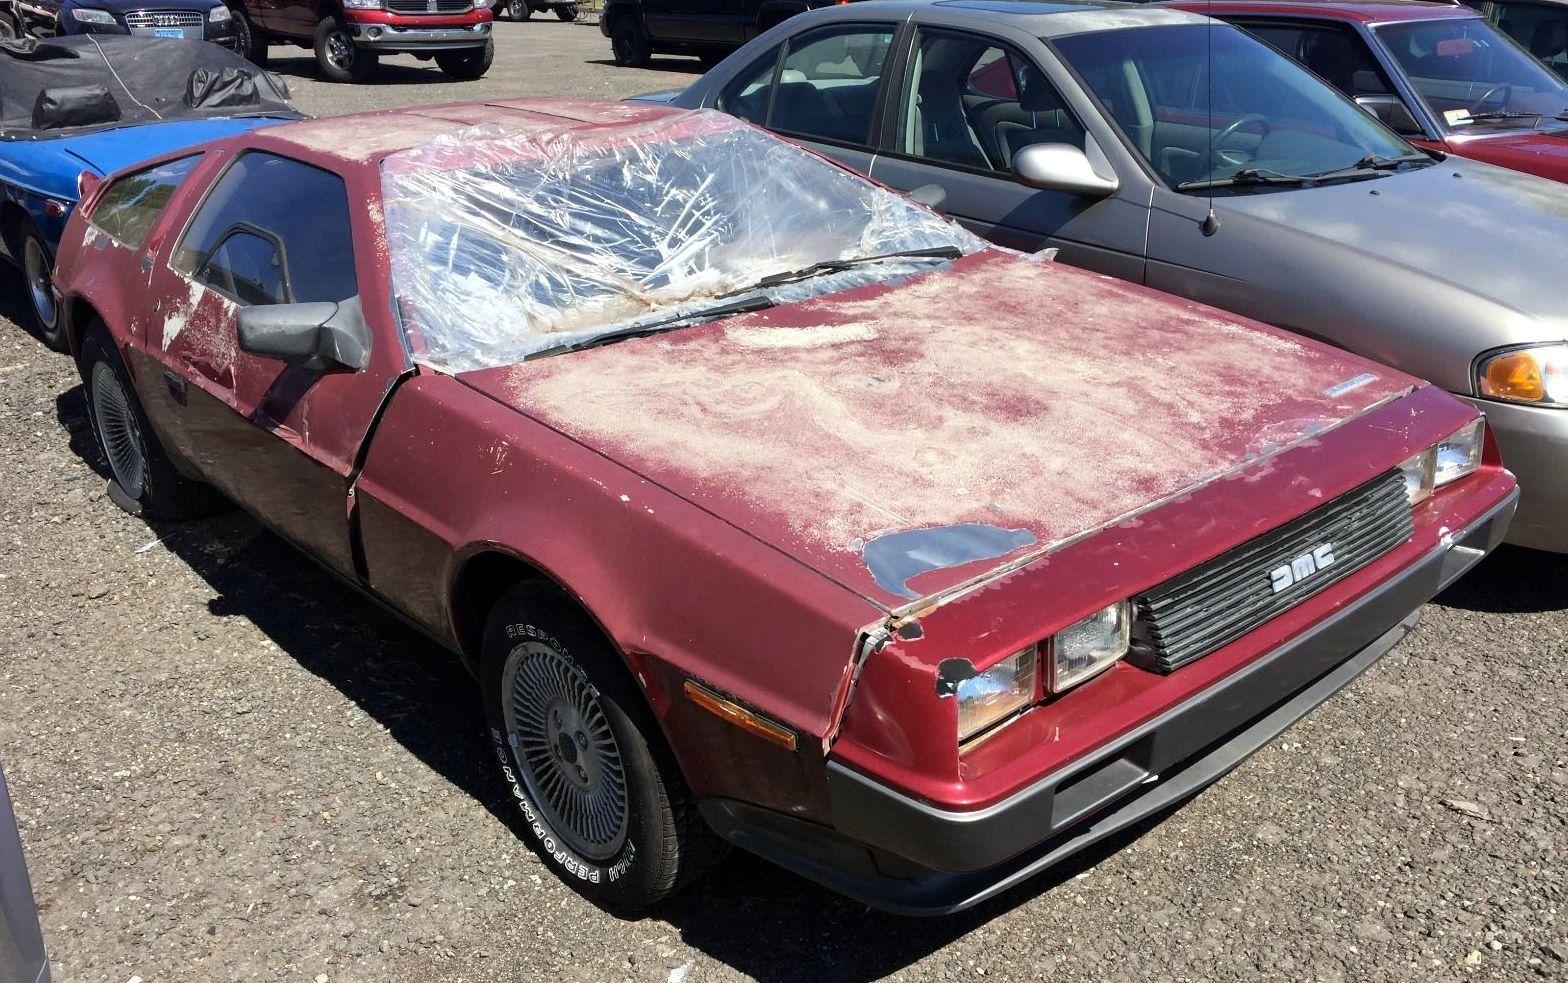 Abandoned Gamble: 1982 DeLorean DMC-12